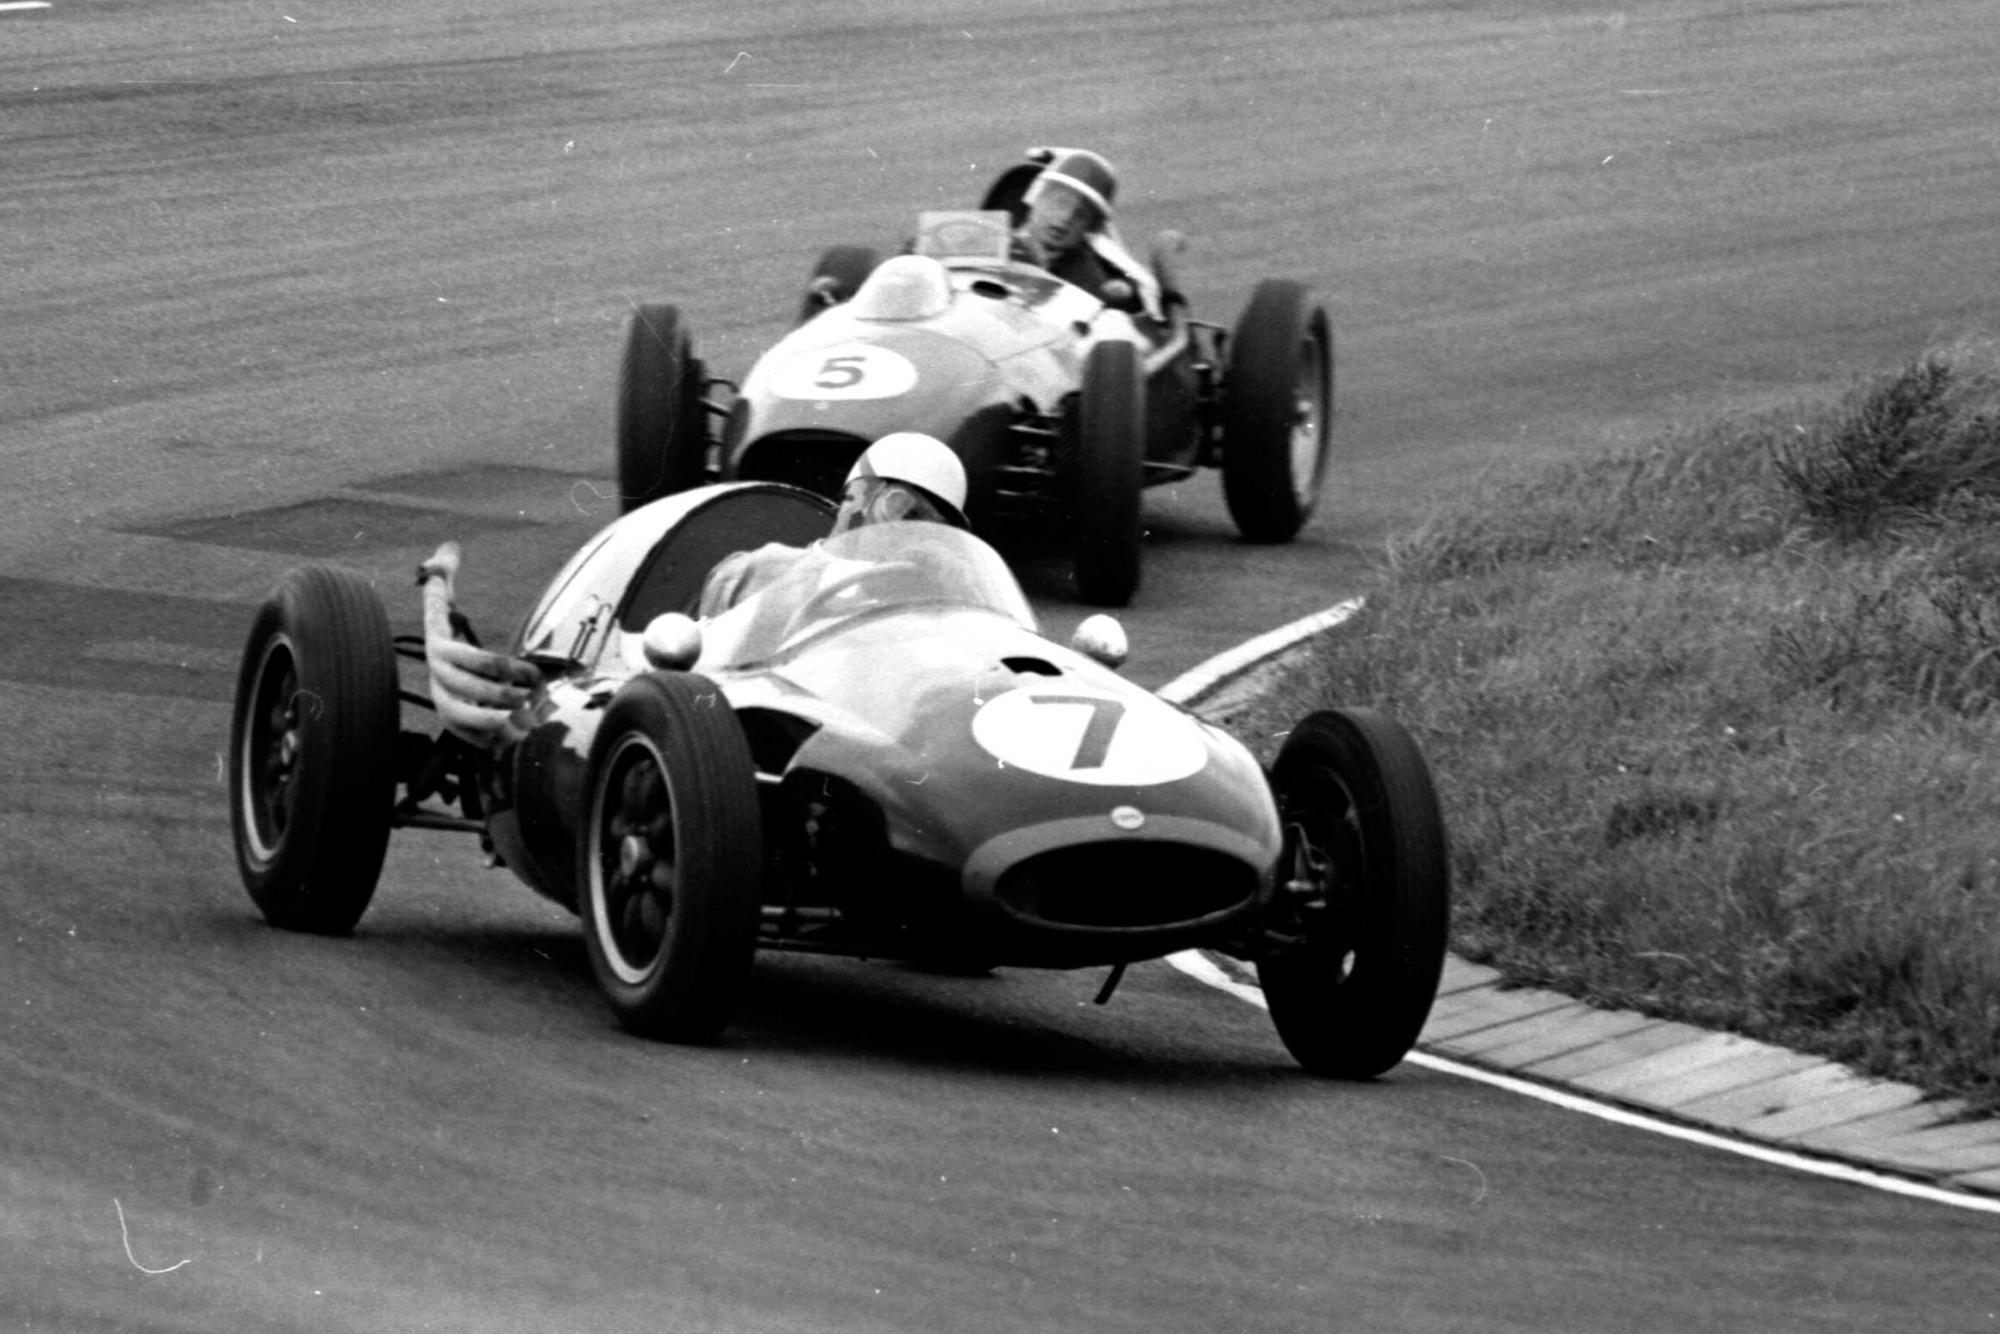 Roy Salvadori driving a Cooper T45 Climax ahead of Mike Hawthorn in a Ferrari Dino 246